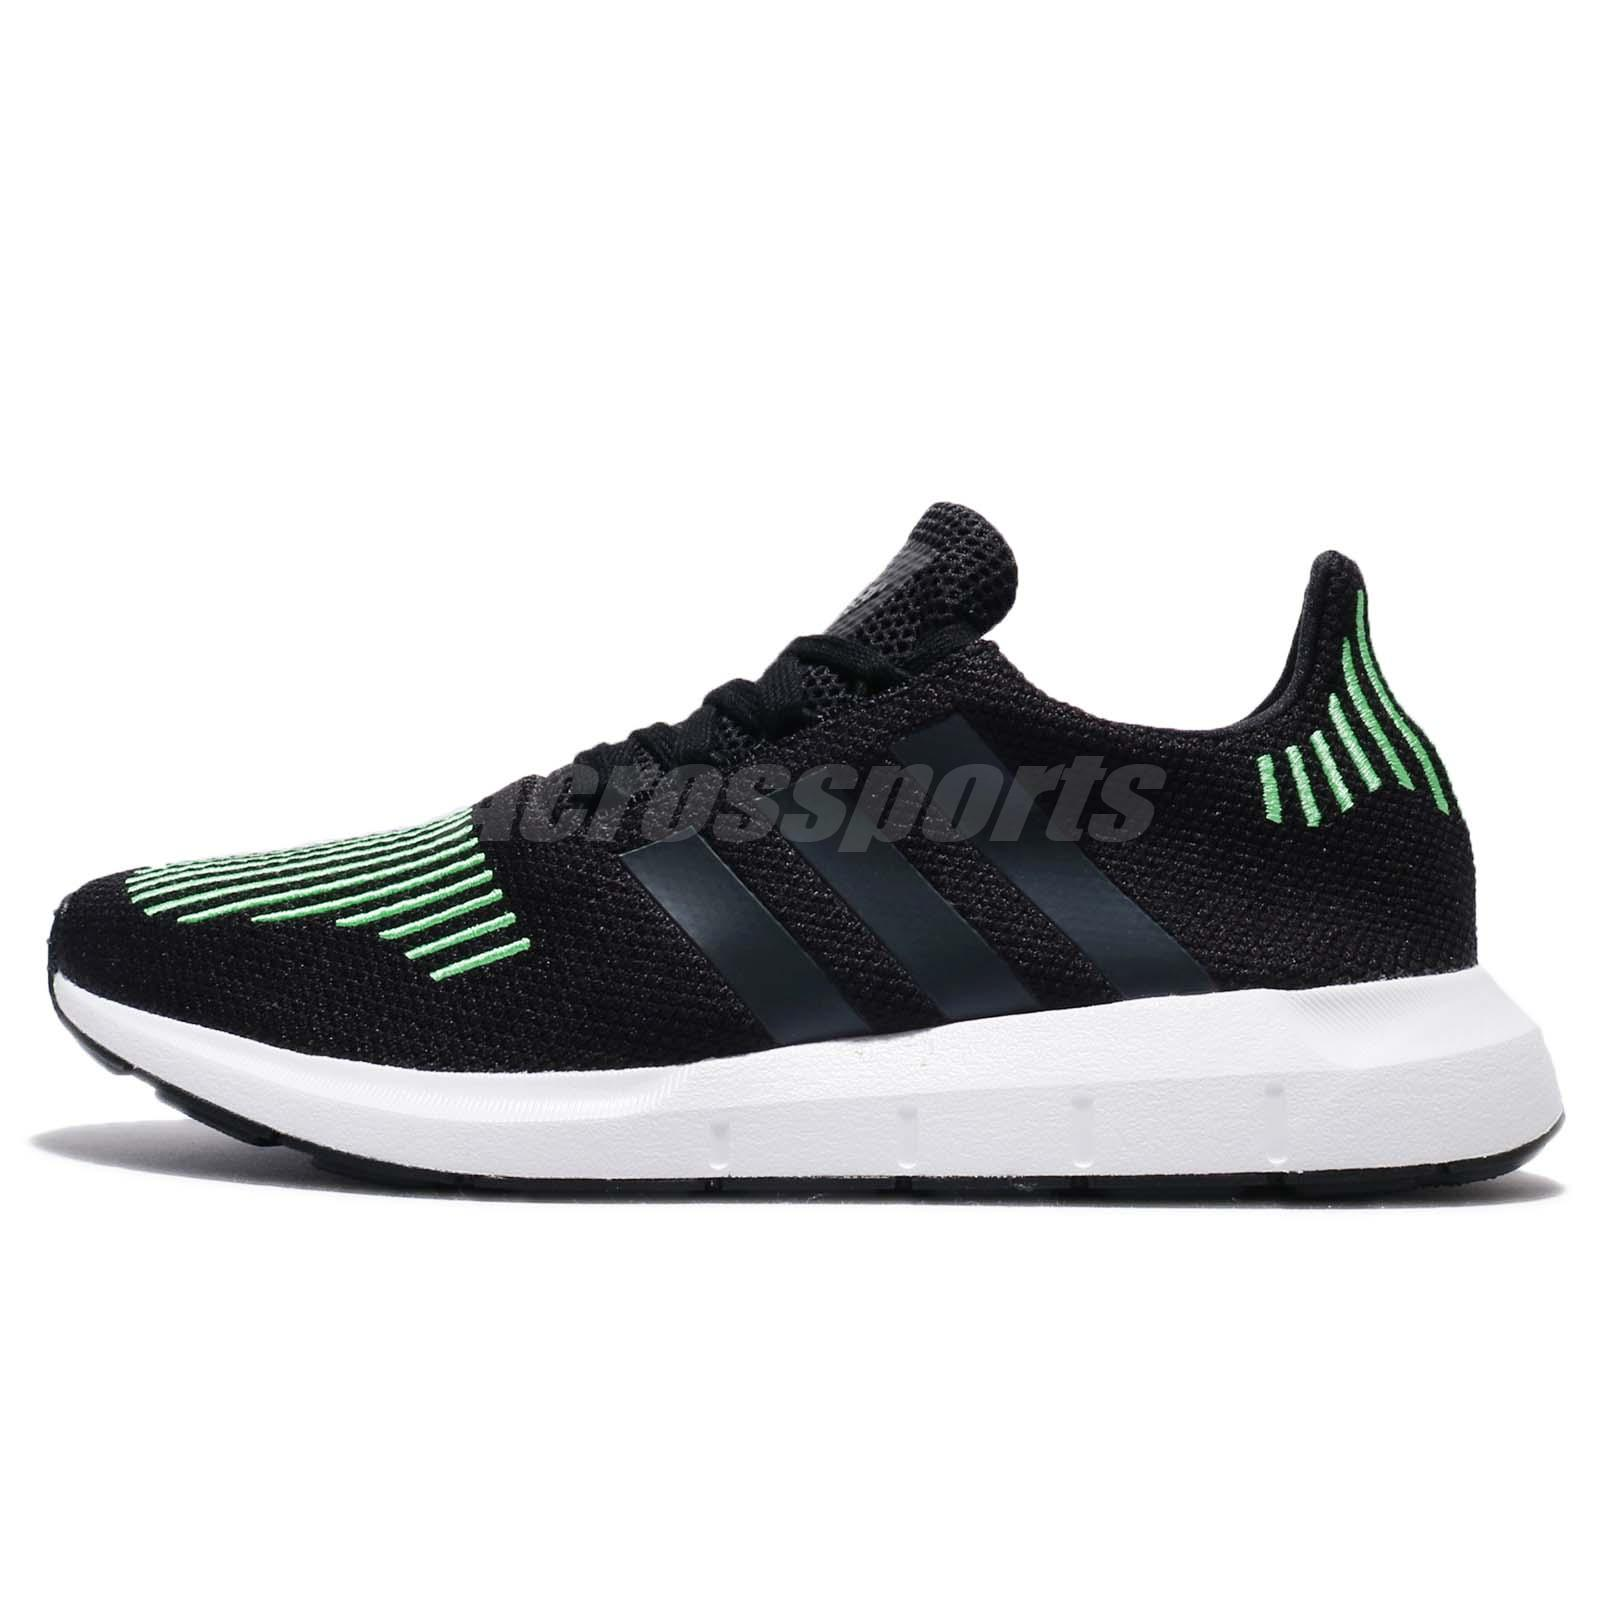 low priced e310c be282 adidas Originals Swift Run Black Green Men Running Shoes .